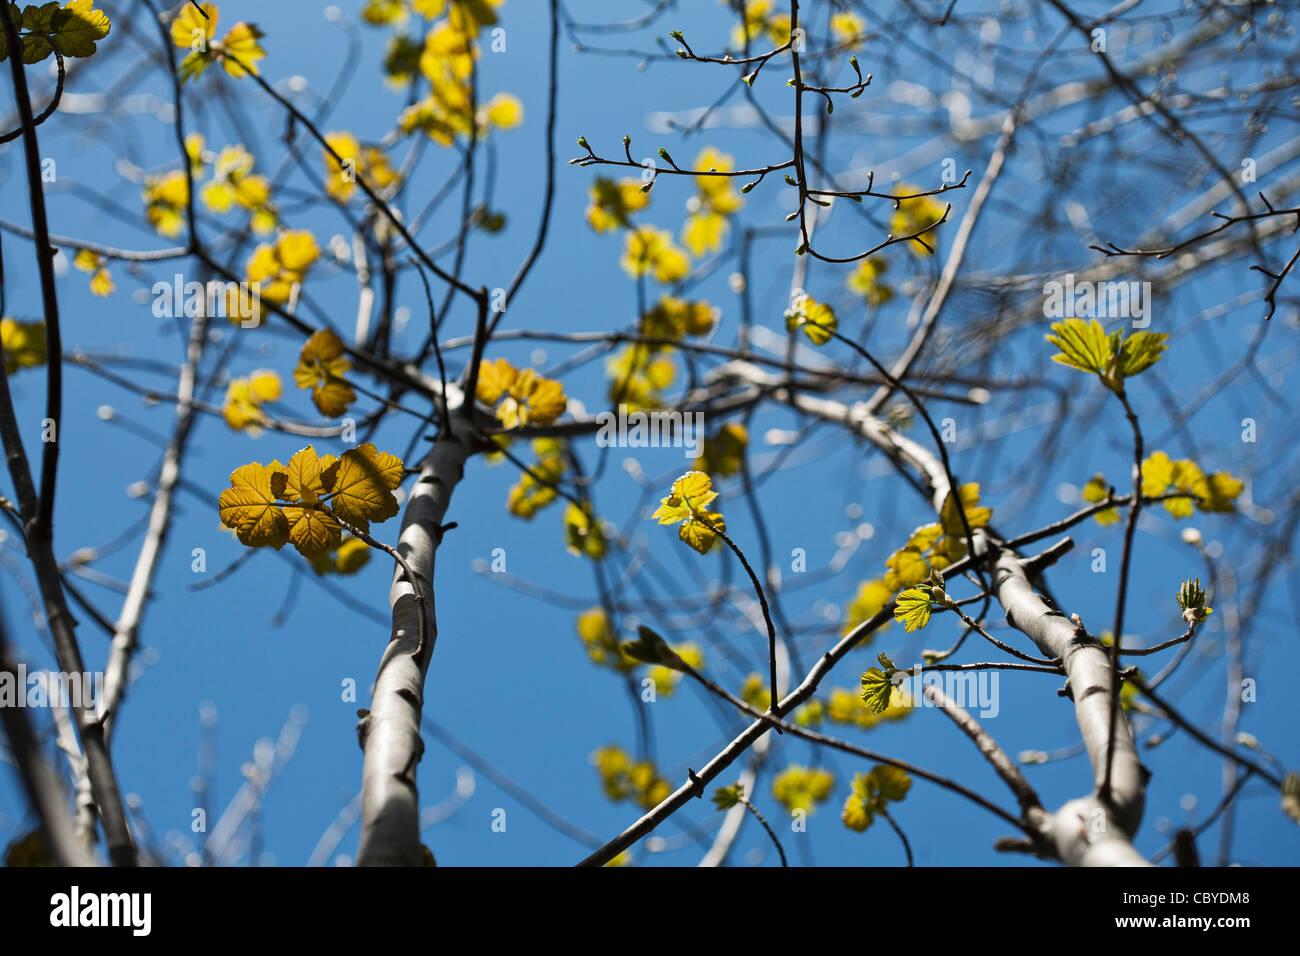 Sycamore Tree Spring Stock Photos Sycamore Tree Spring Stock